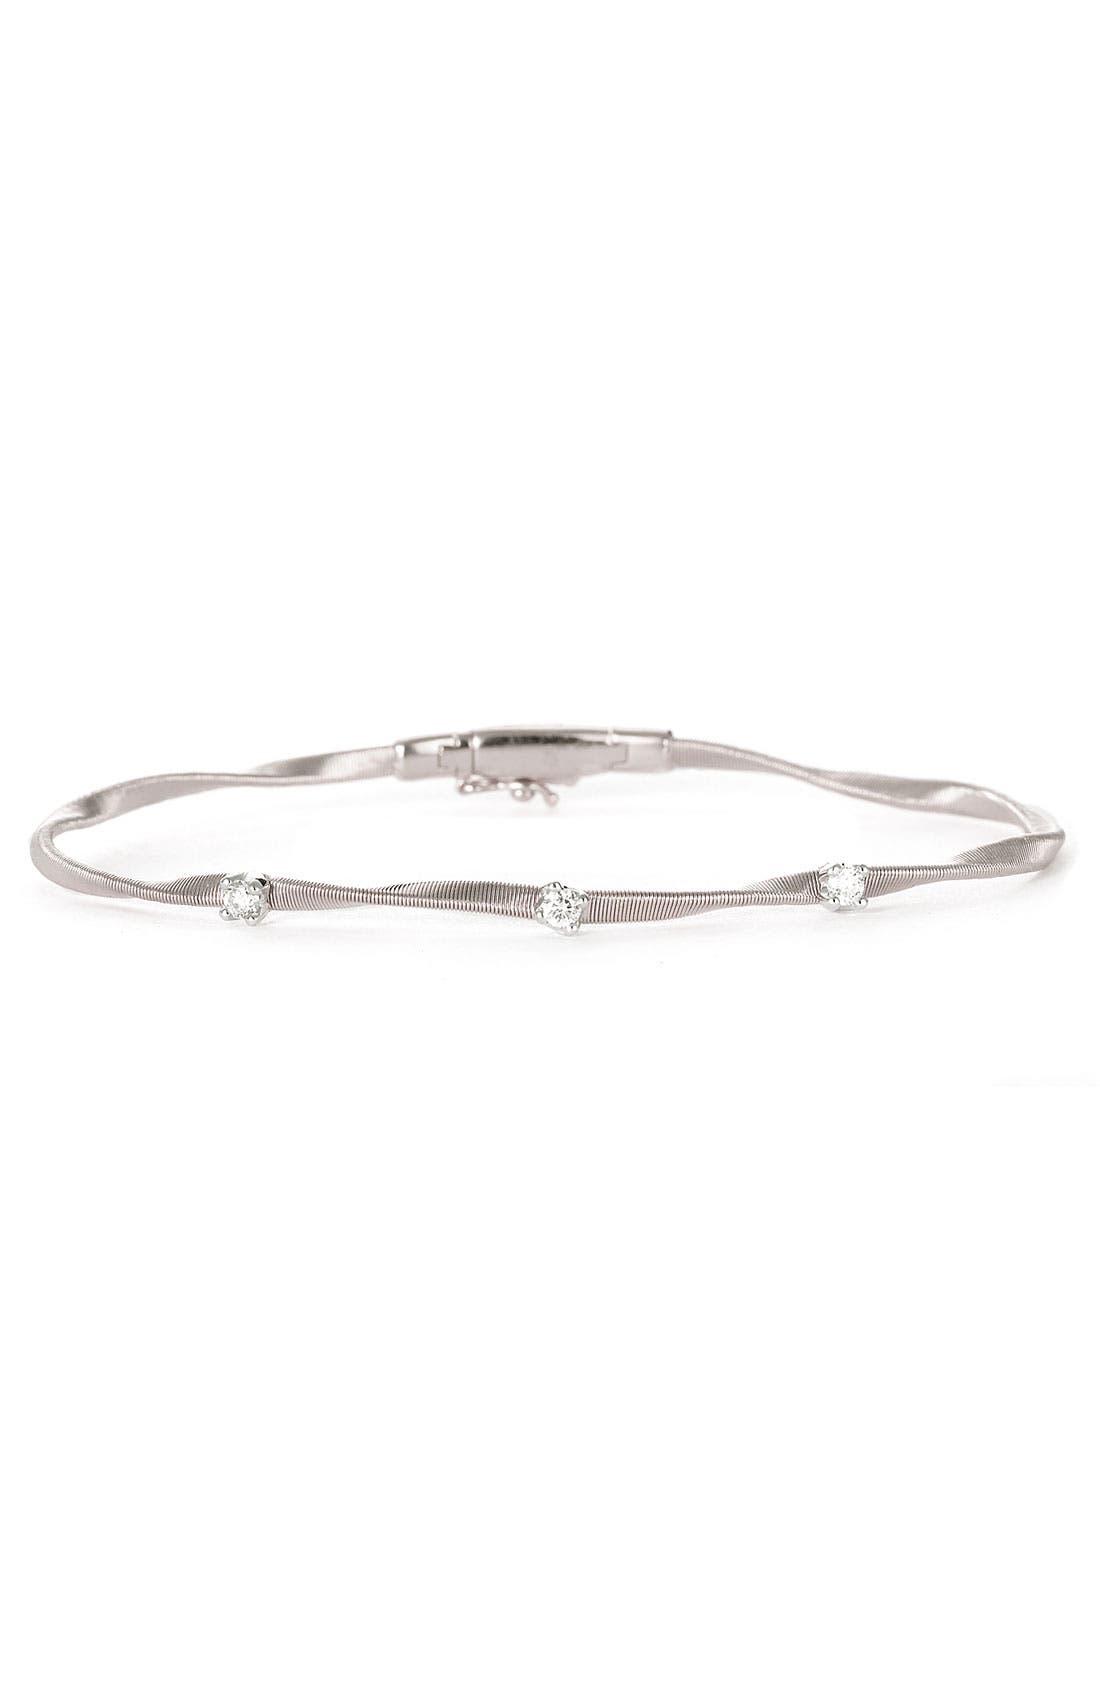 Alternate Image 1 Selected - Marco Bicego 'Marrakech' Single Strand Diamond Bracelet